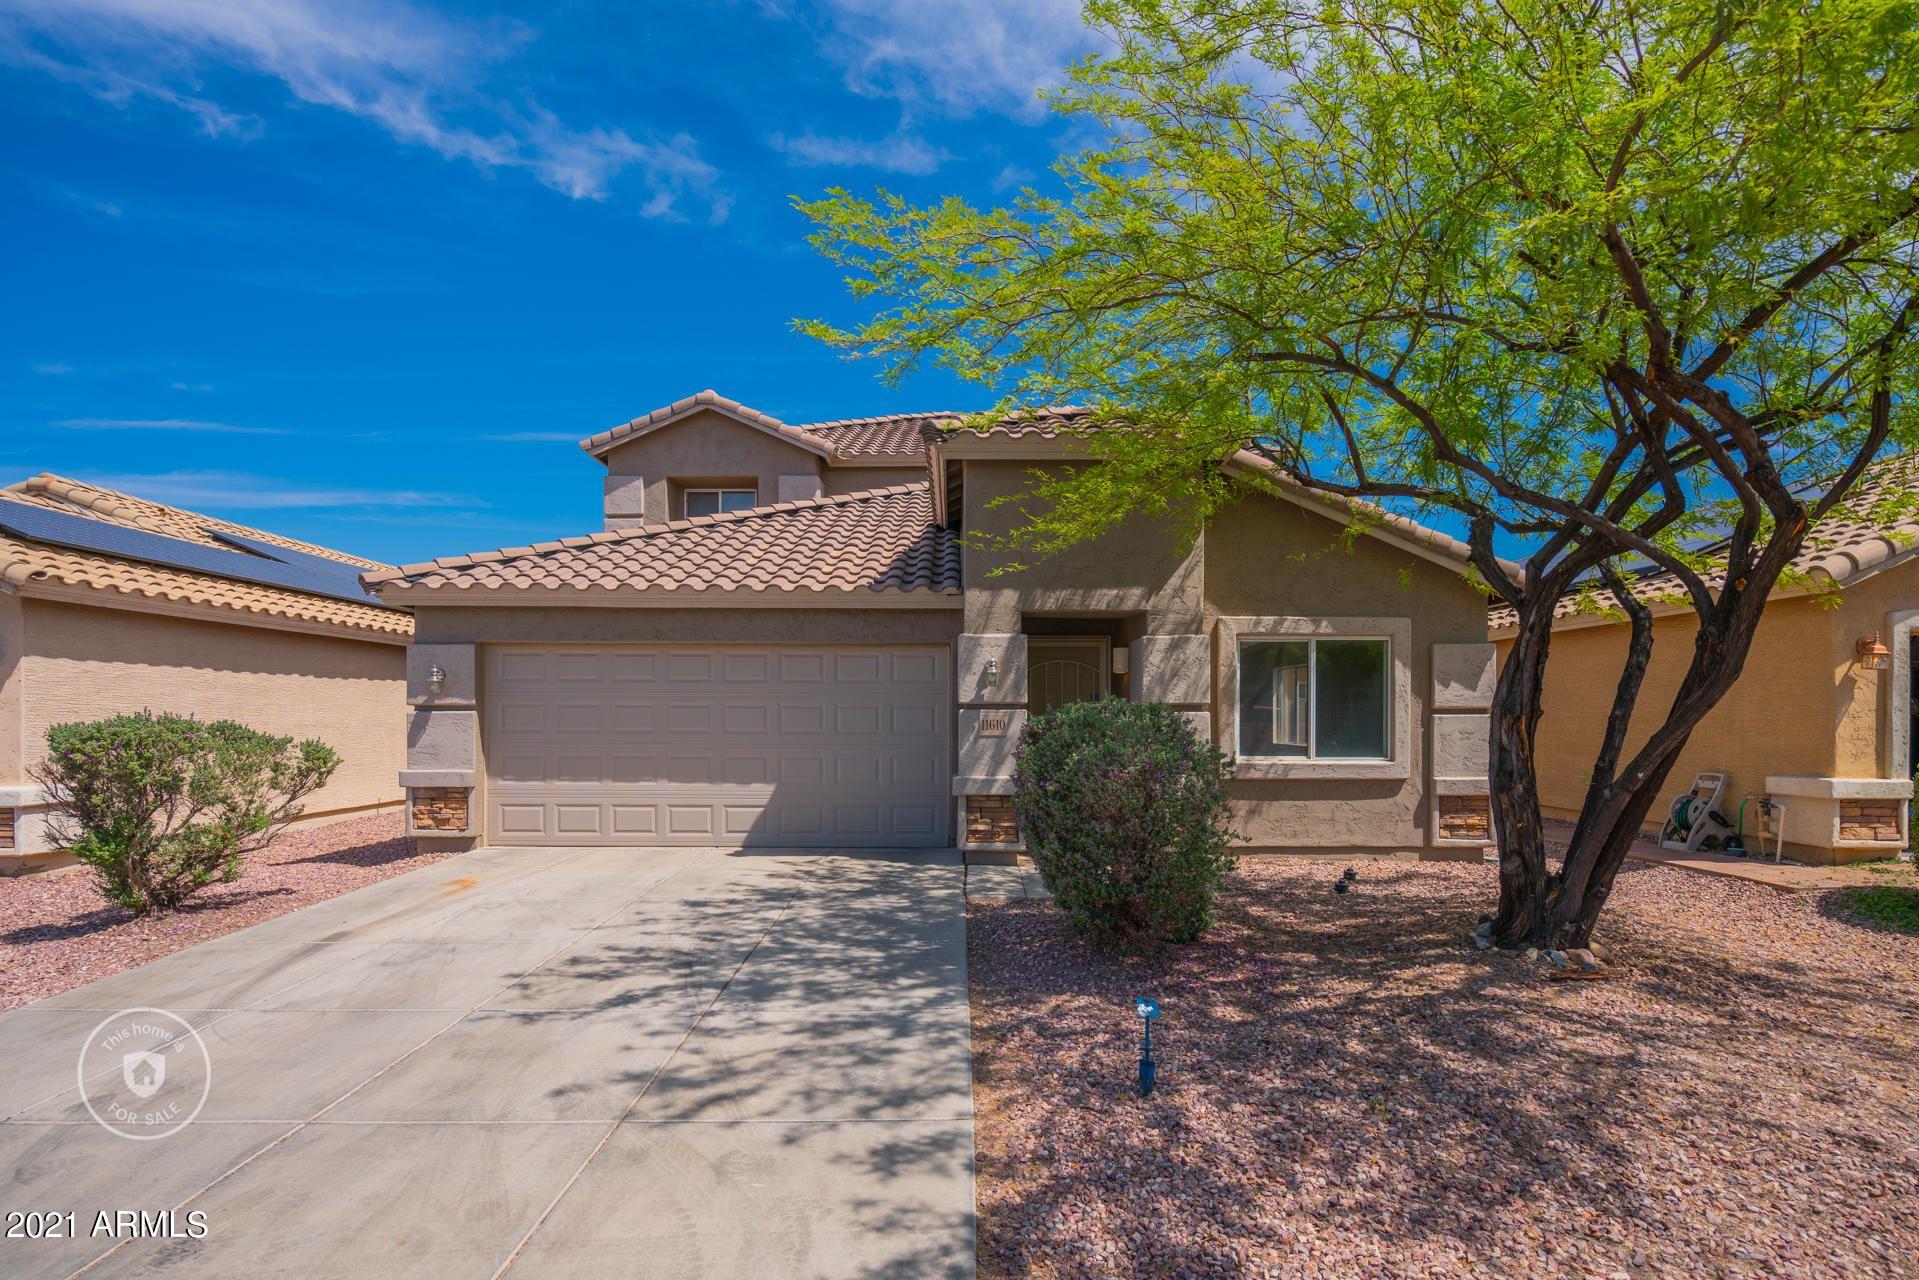 Photo of 11610 W BROWN Street, Youngtown, AZ 85363 (MLS # 6231980)